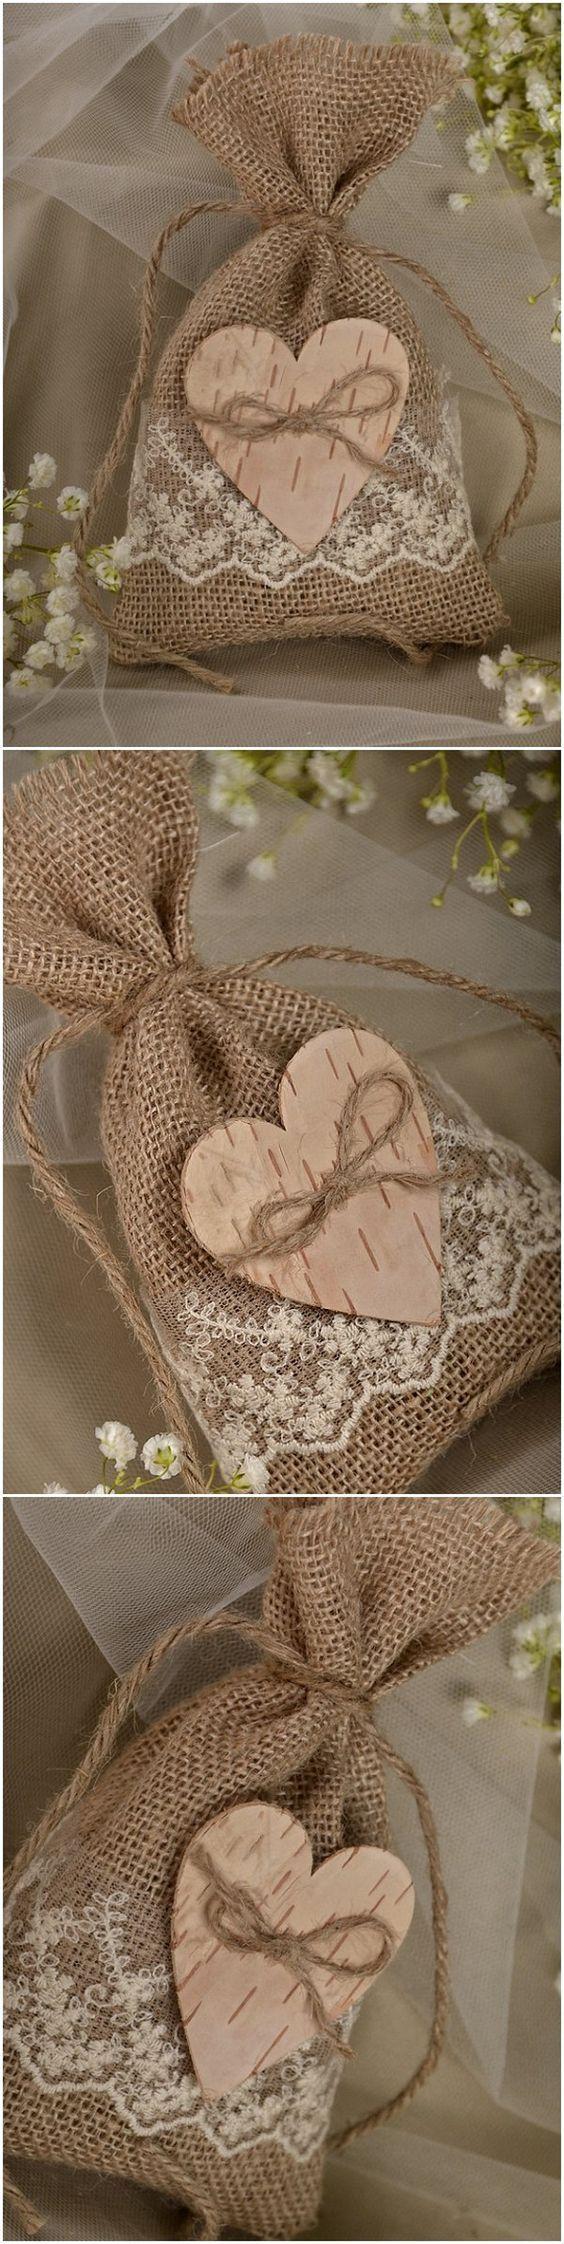 Rustic country burlap and lace wedding favor bags #weddingideas #rusticwedding…